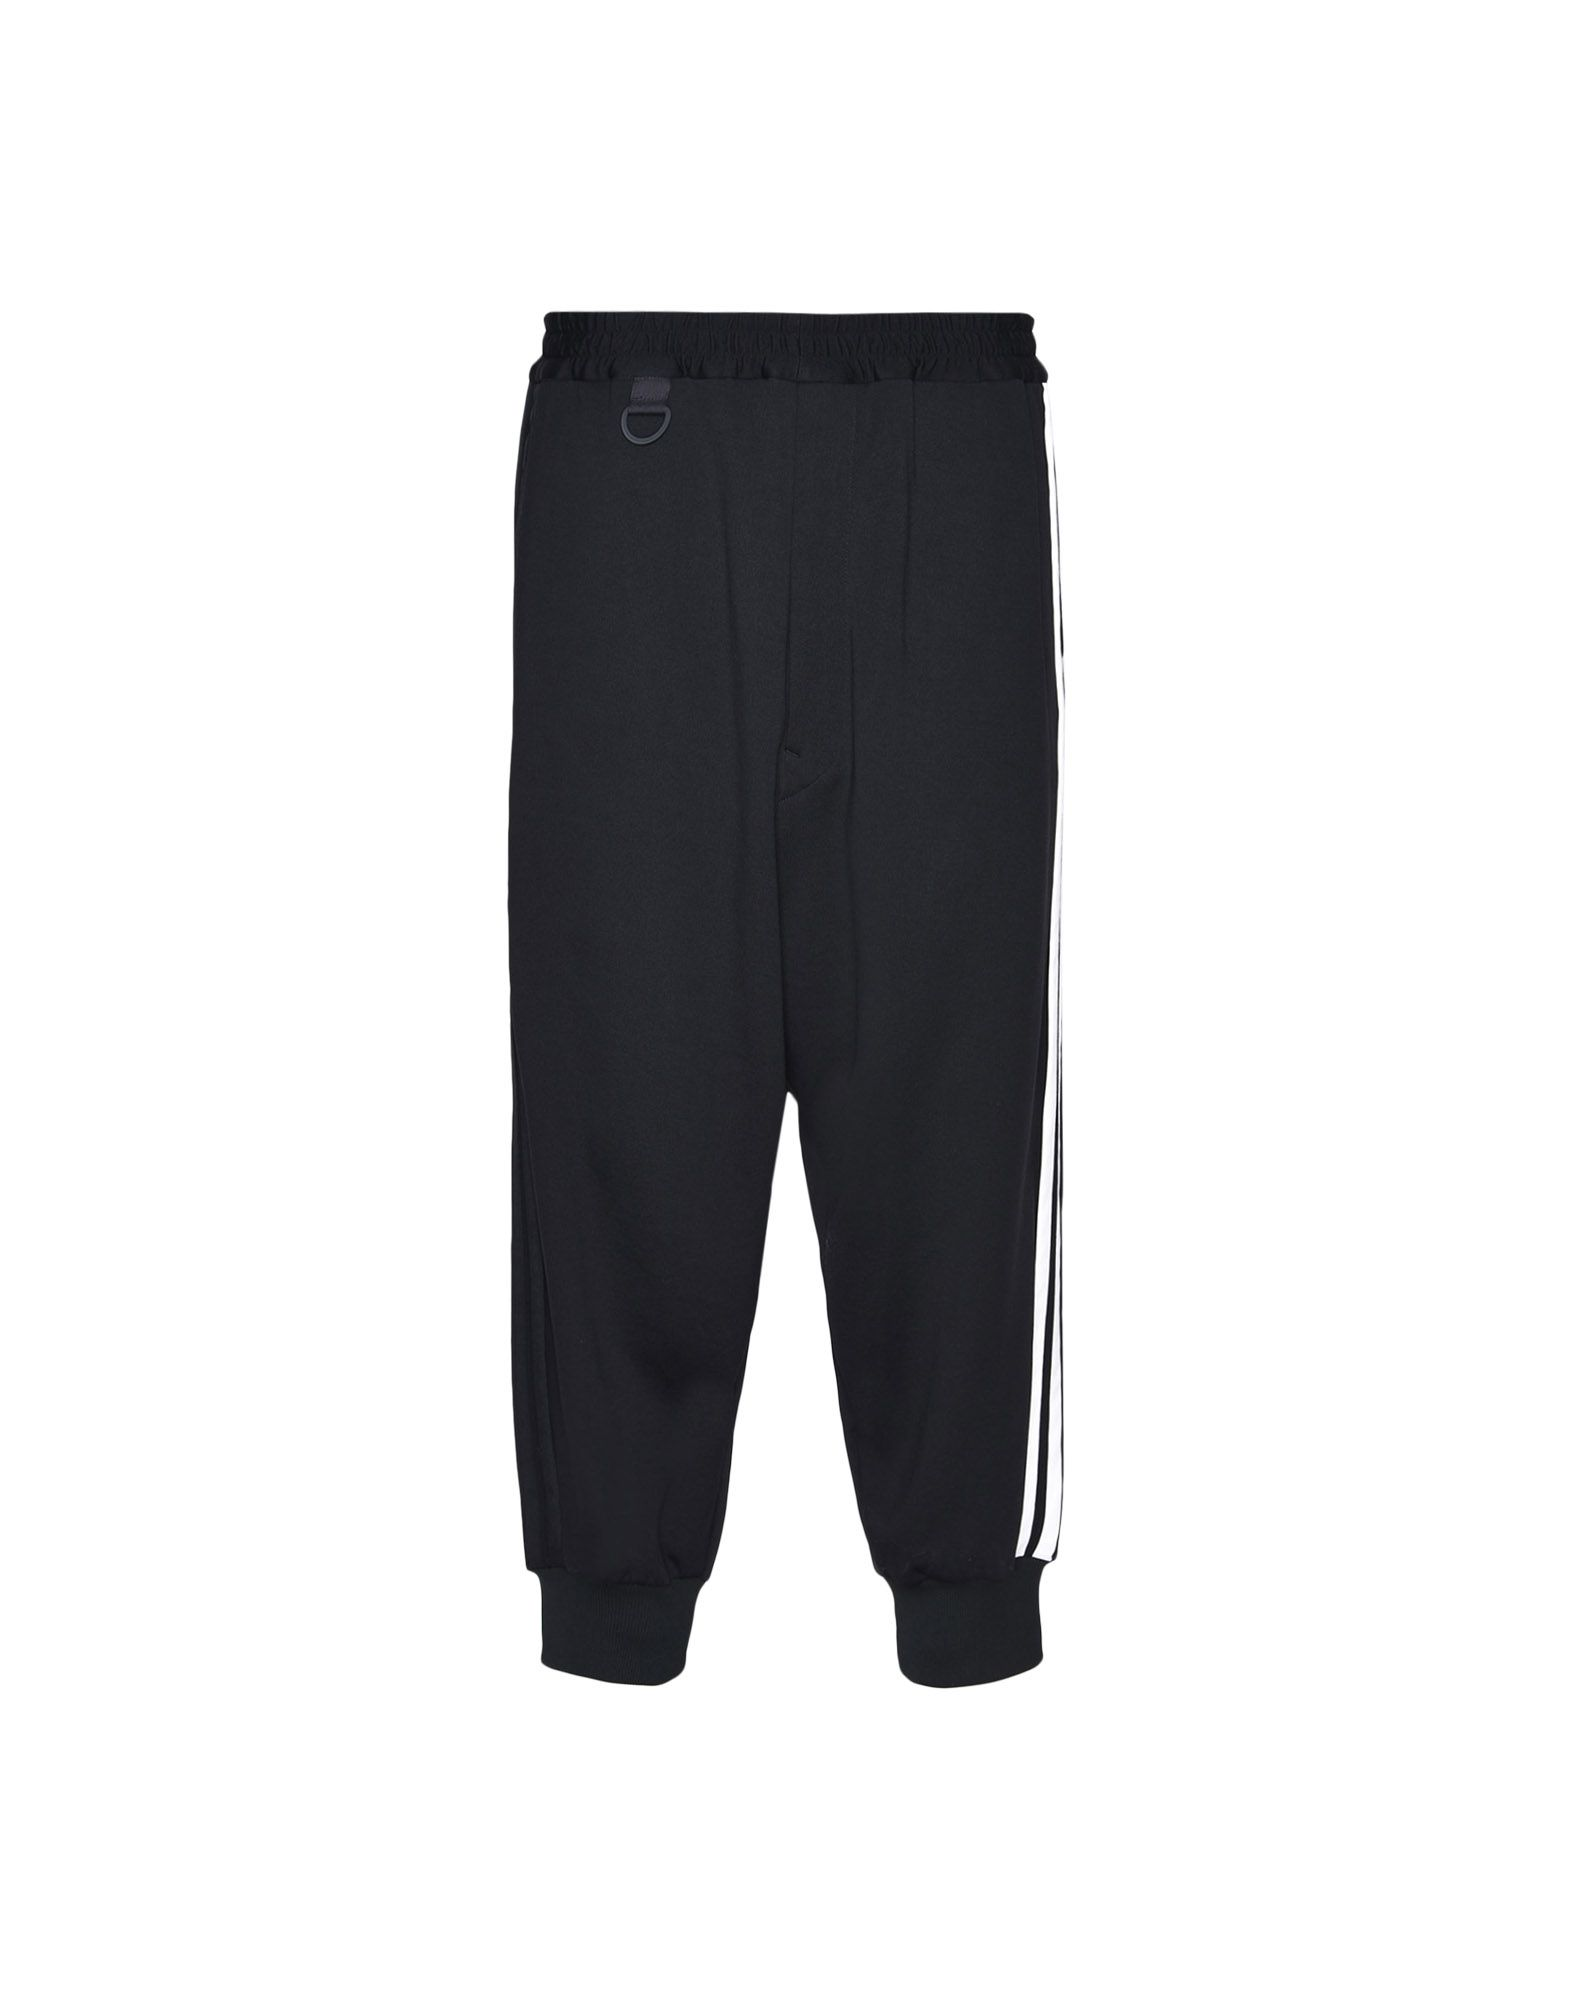 Y-3 Y-3 3-Stripes Selvedge Matte Track Pants Track pant Man f